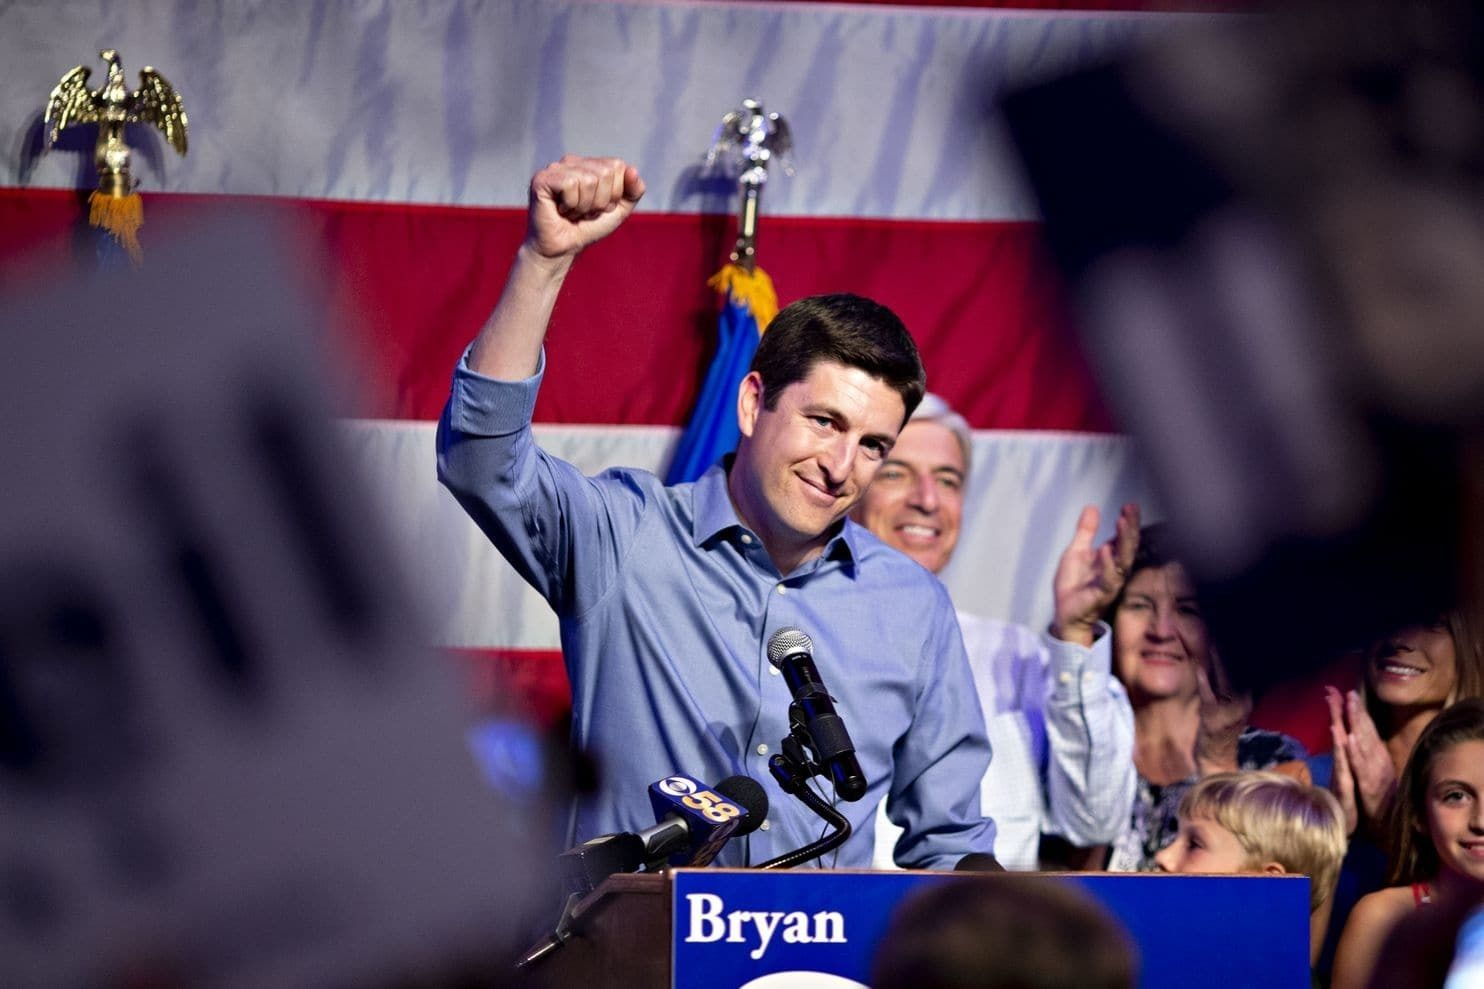 Bryan new